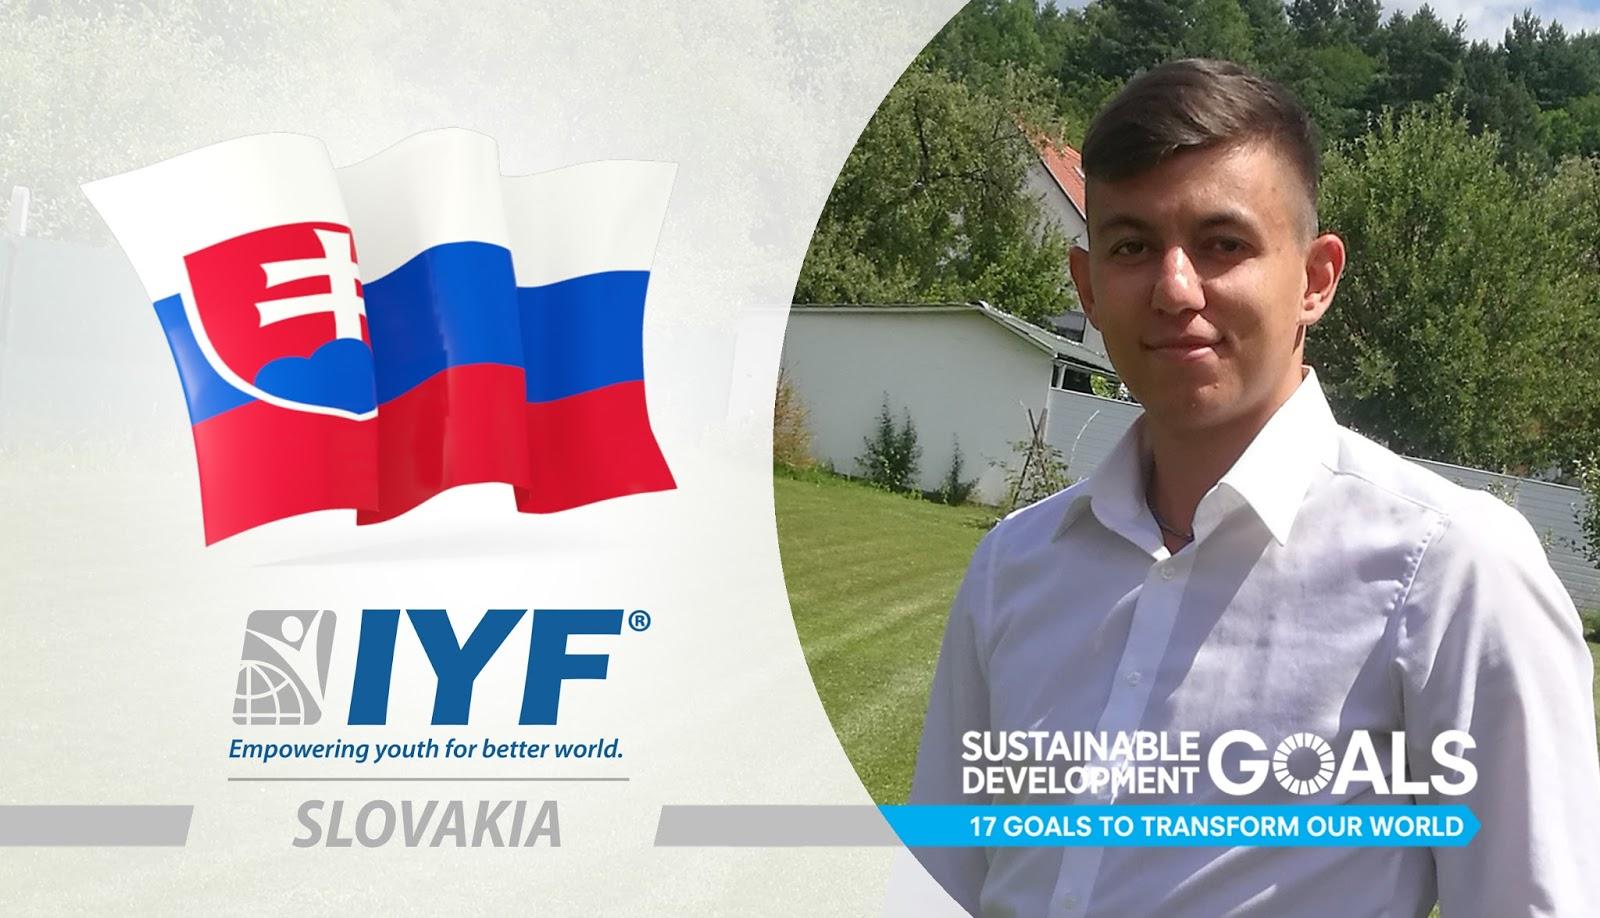 Ján Borko, IYF Representative in Slovakia